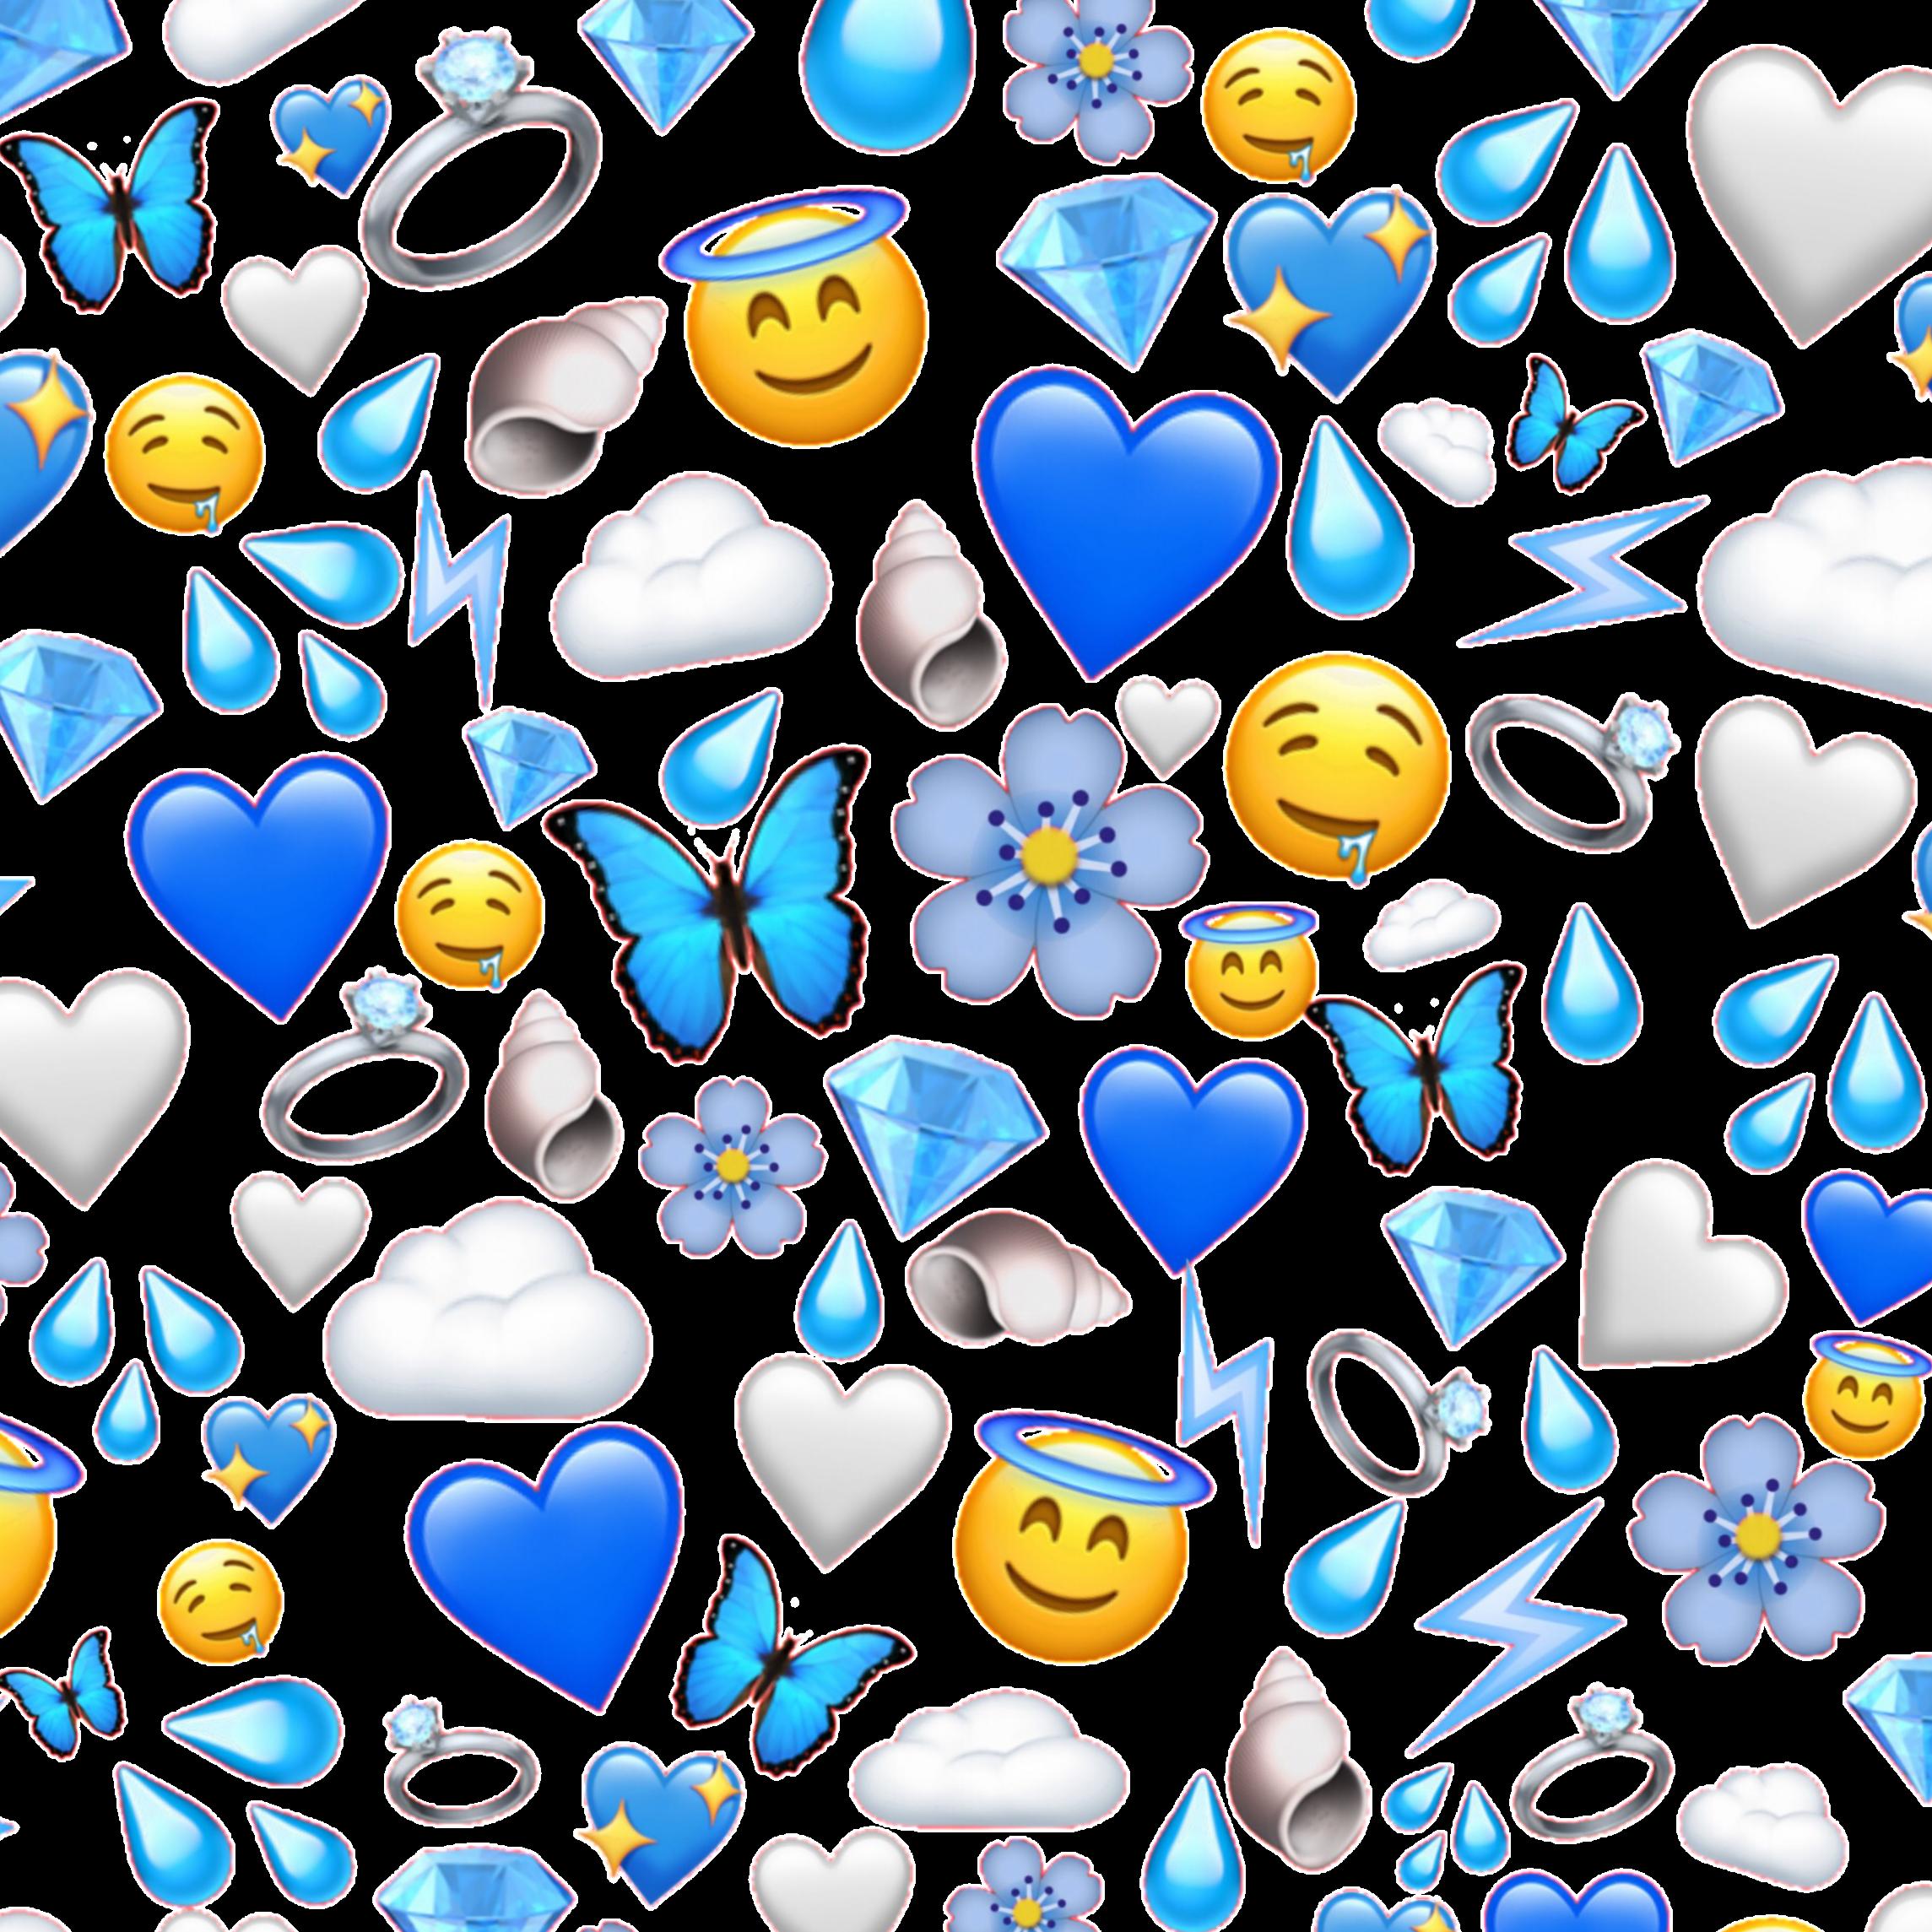 blue wallpaper bluewallpaper clouds cloud emojis emoji...